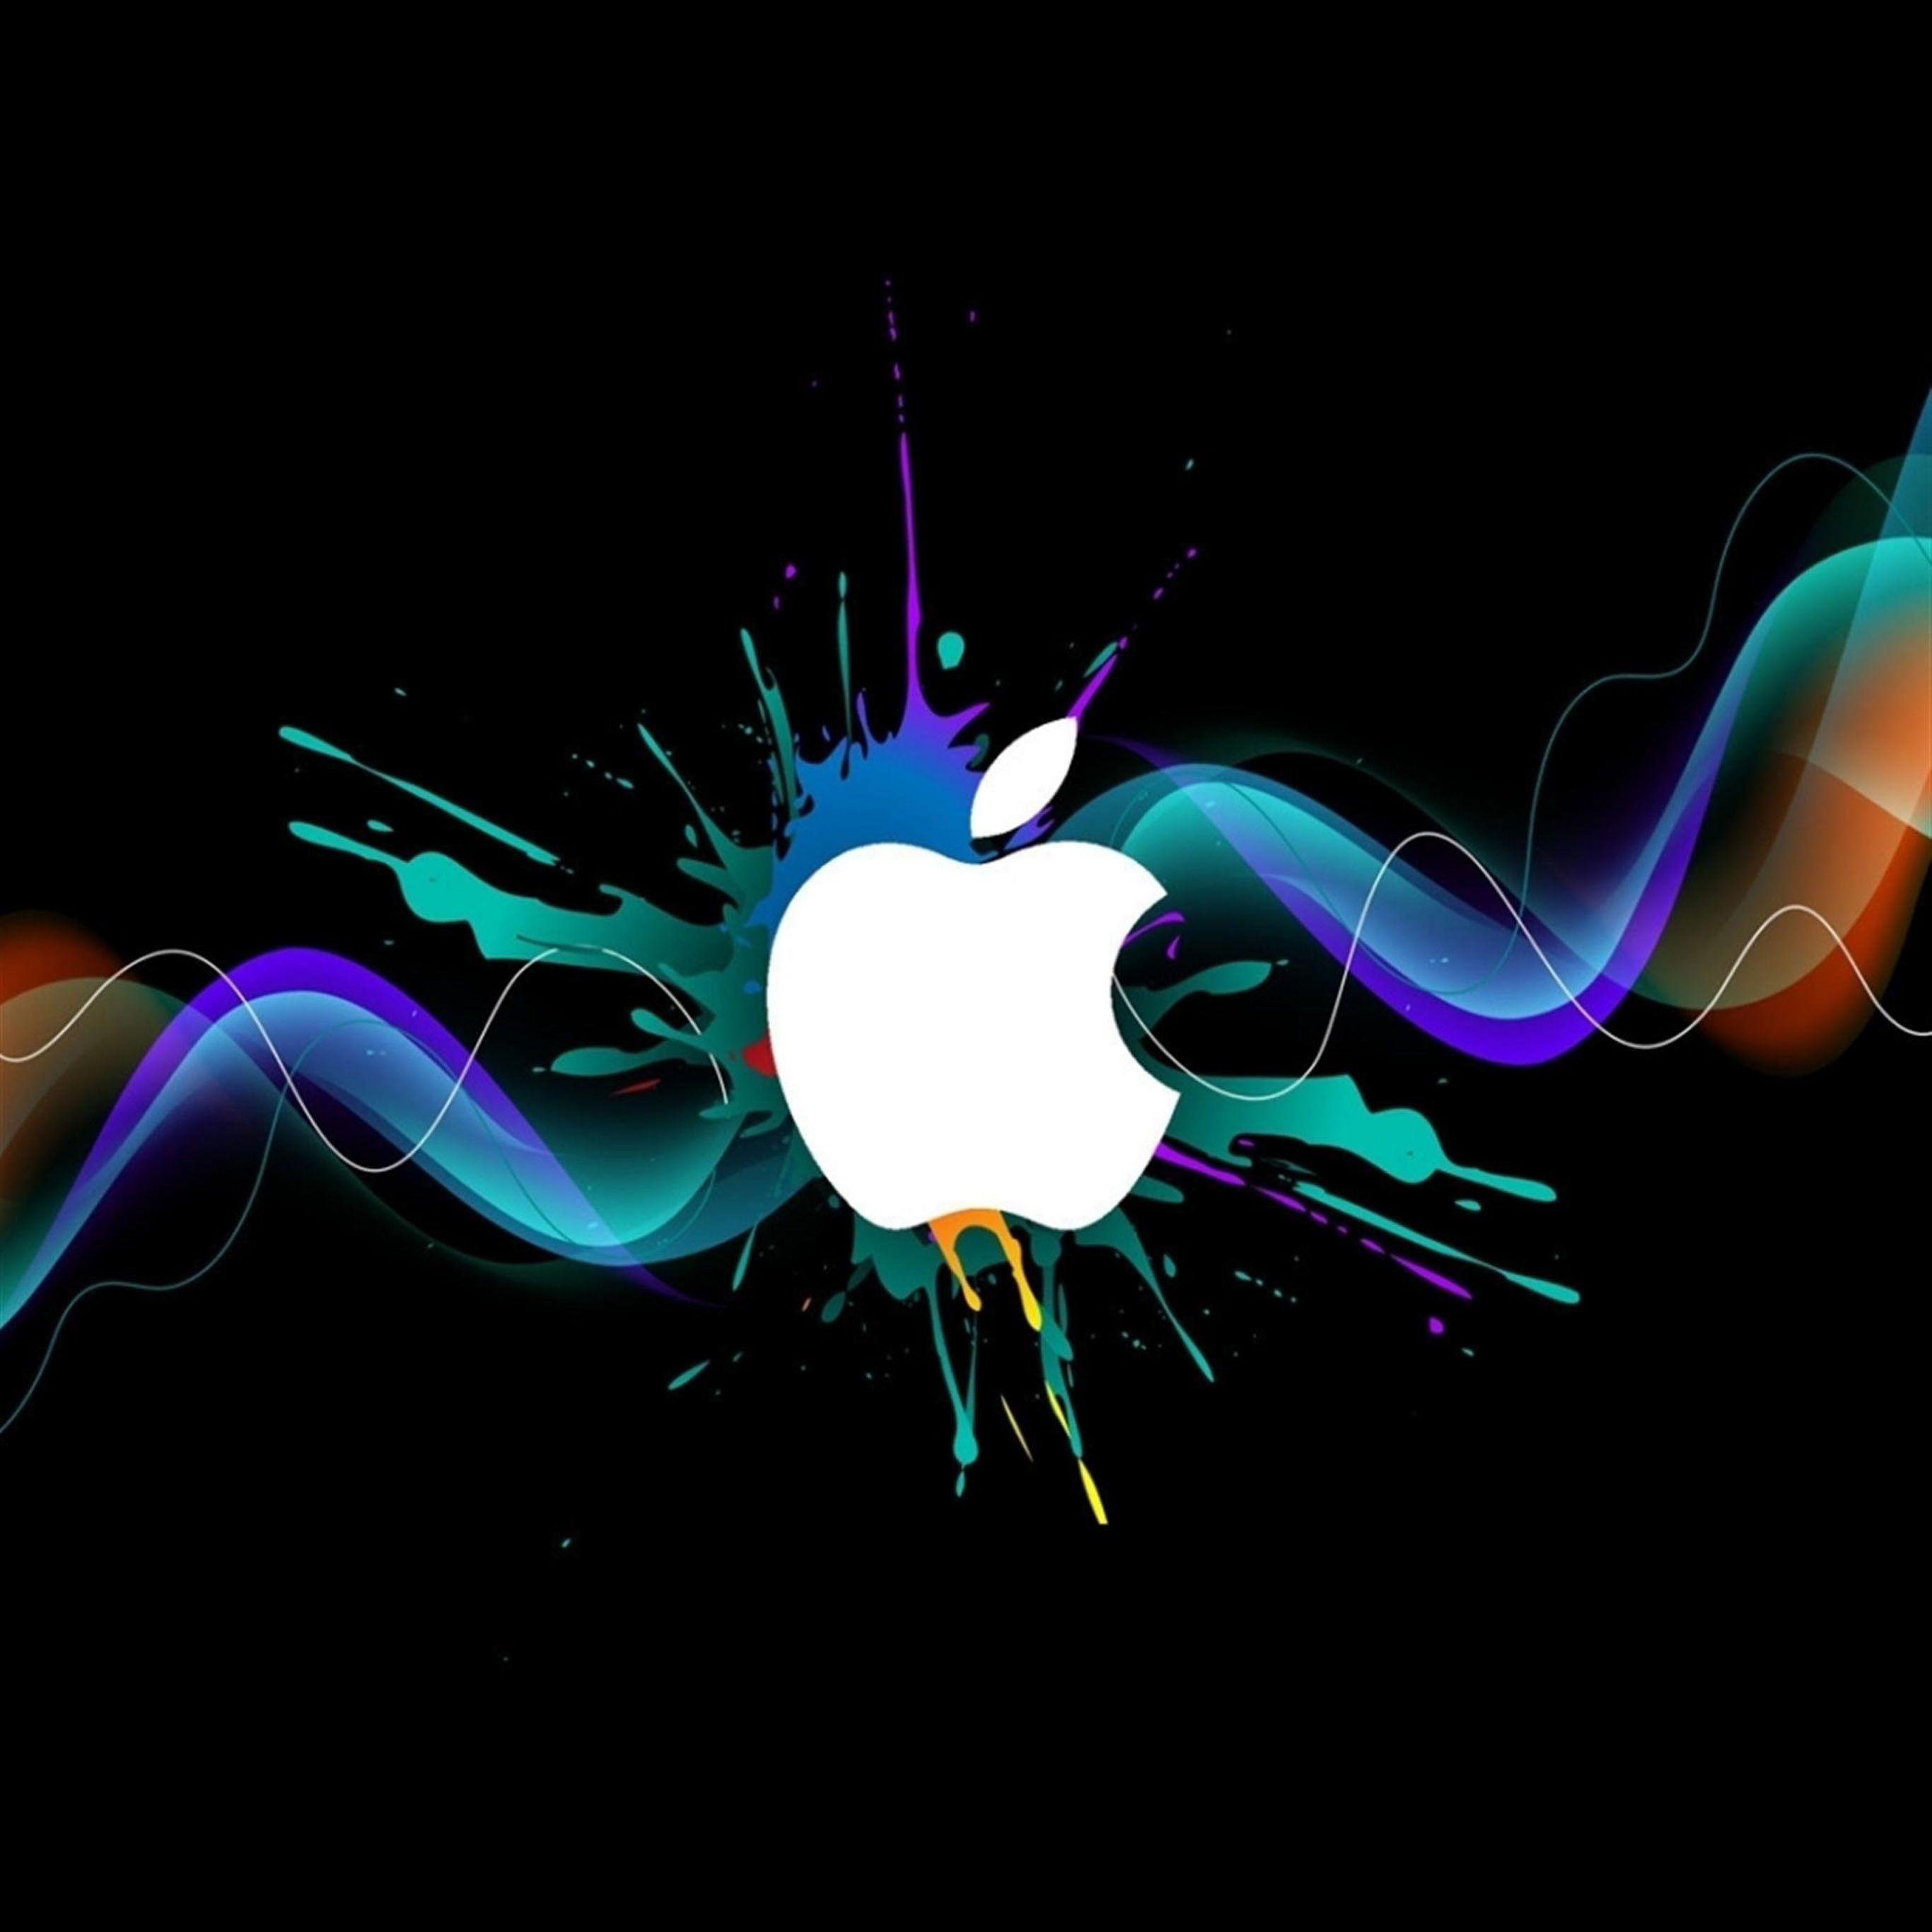 Apple IPad Pro Wallpapers   Top Apple IPad Pro Backgrounds 2732x2732